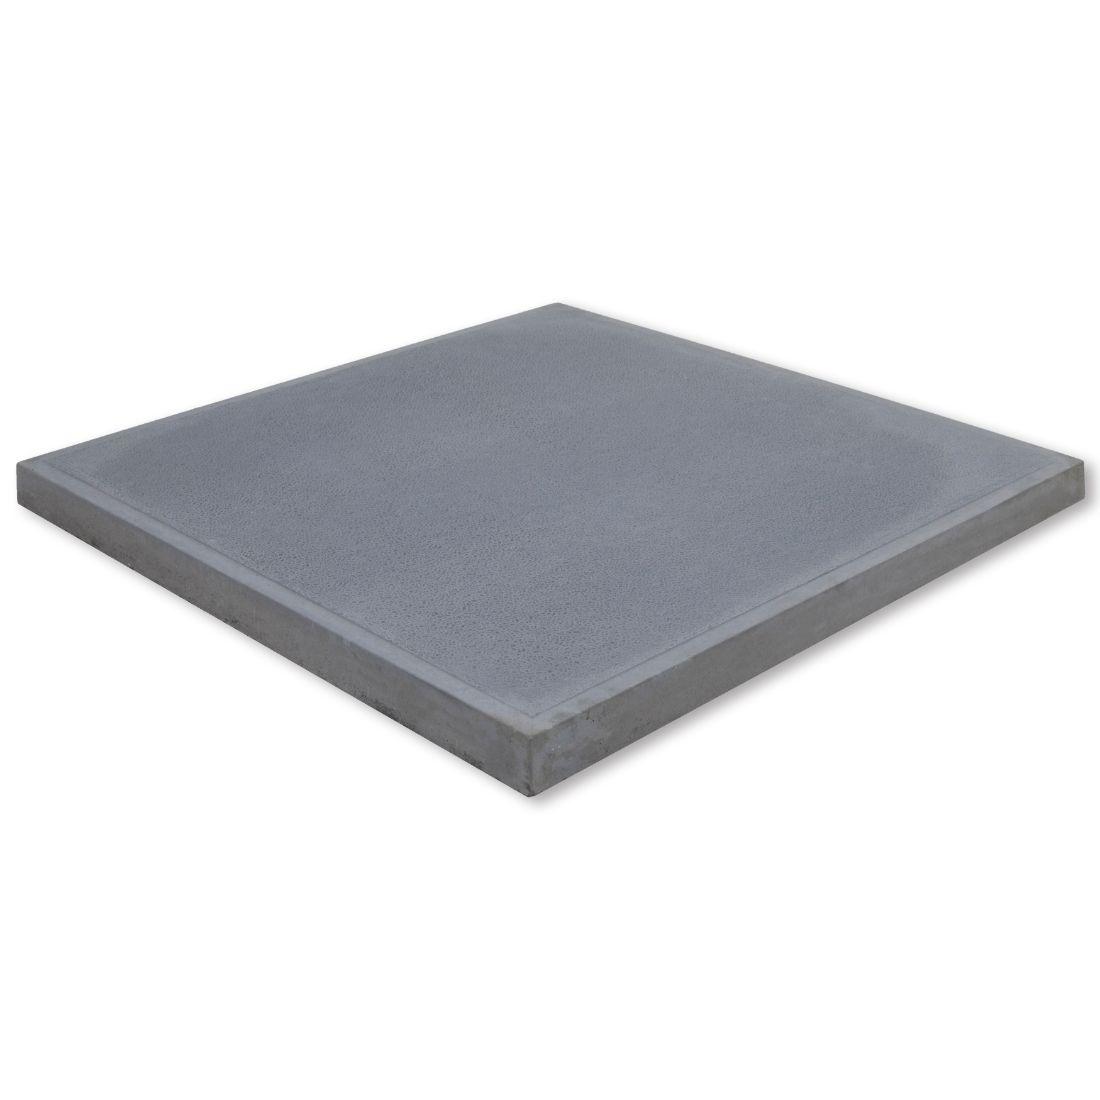 Viltorio Concrete Paver 600 x 600 x 37mm Grey River